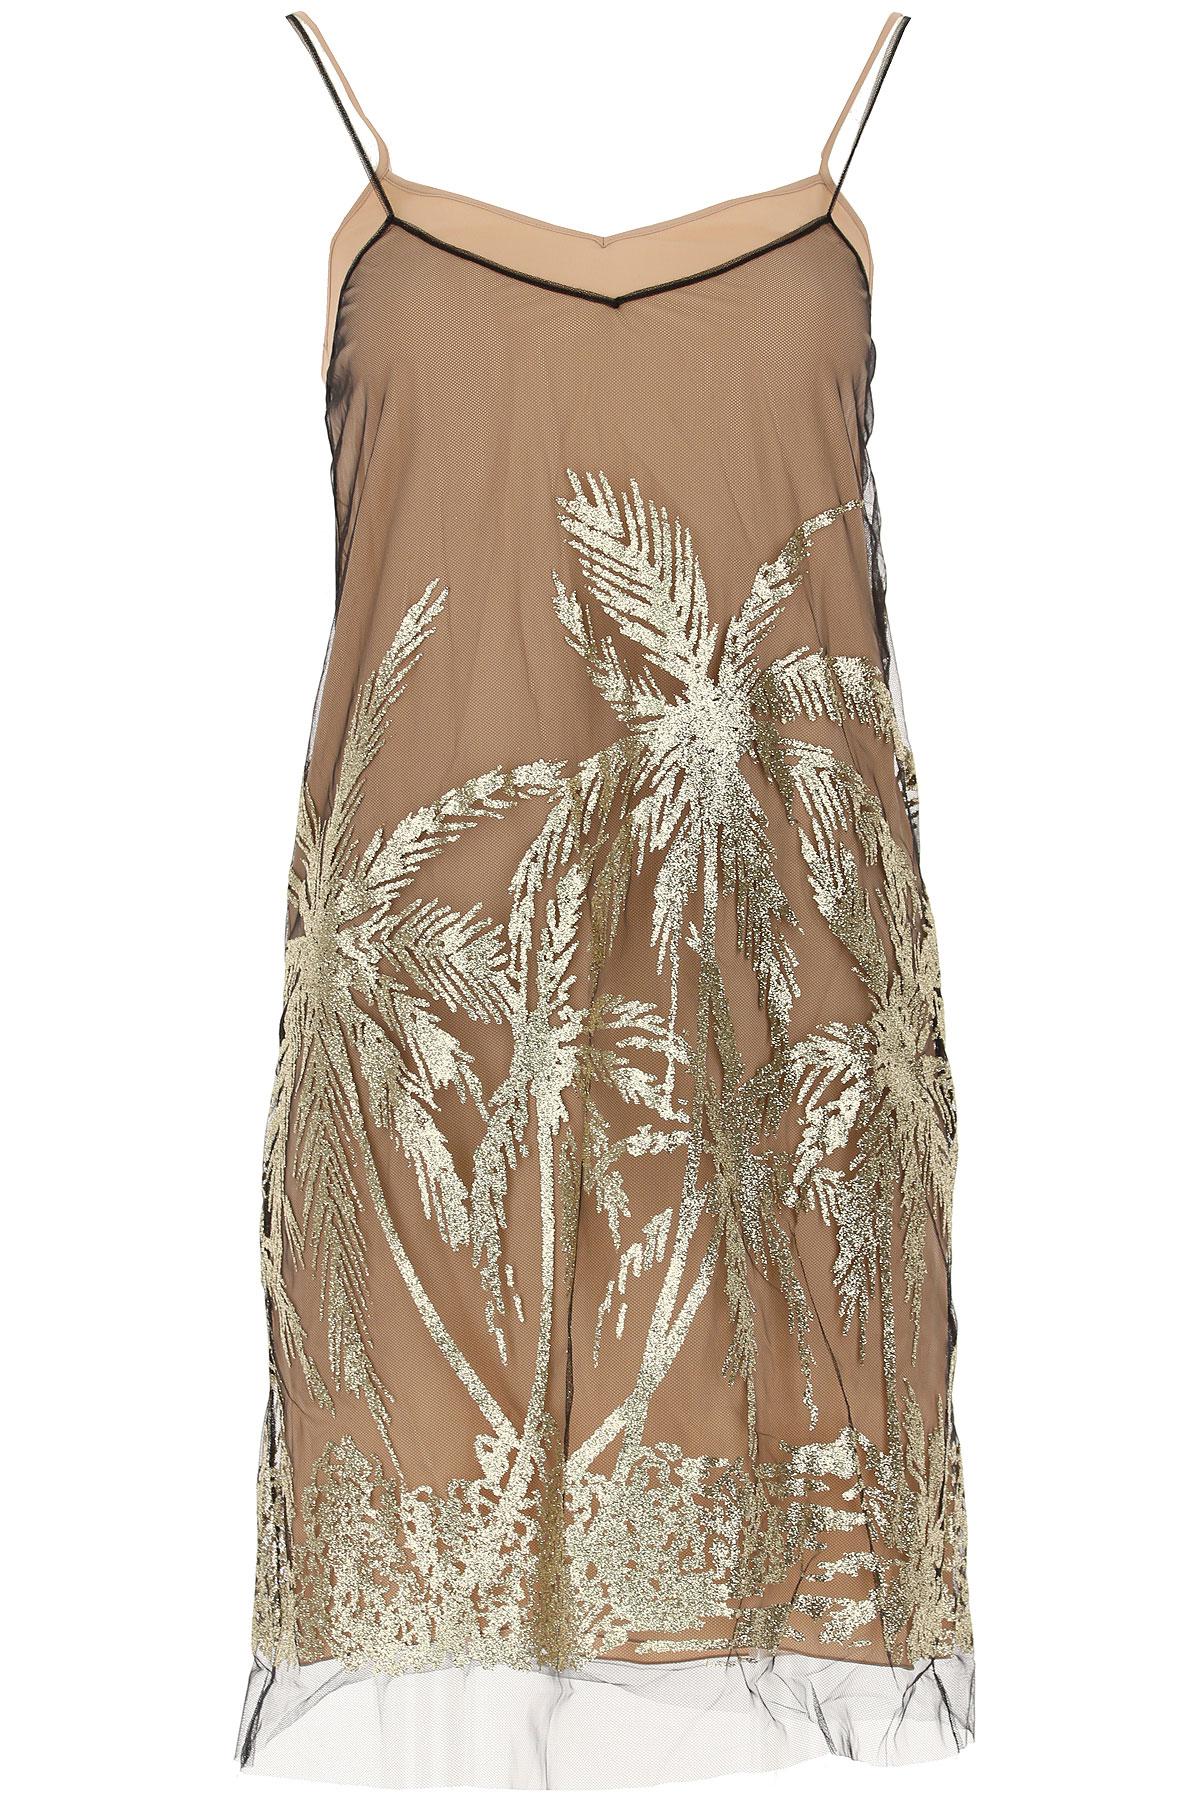 Image of Gilmar Dress for Women, Evening Cocktail Party, Pink, polyamide, 2017, UK 8 - US 6 - EU 40 UK 10 - US 8 - EU 42 UK 12 - US 10 - EU 44